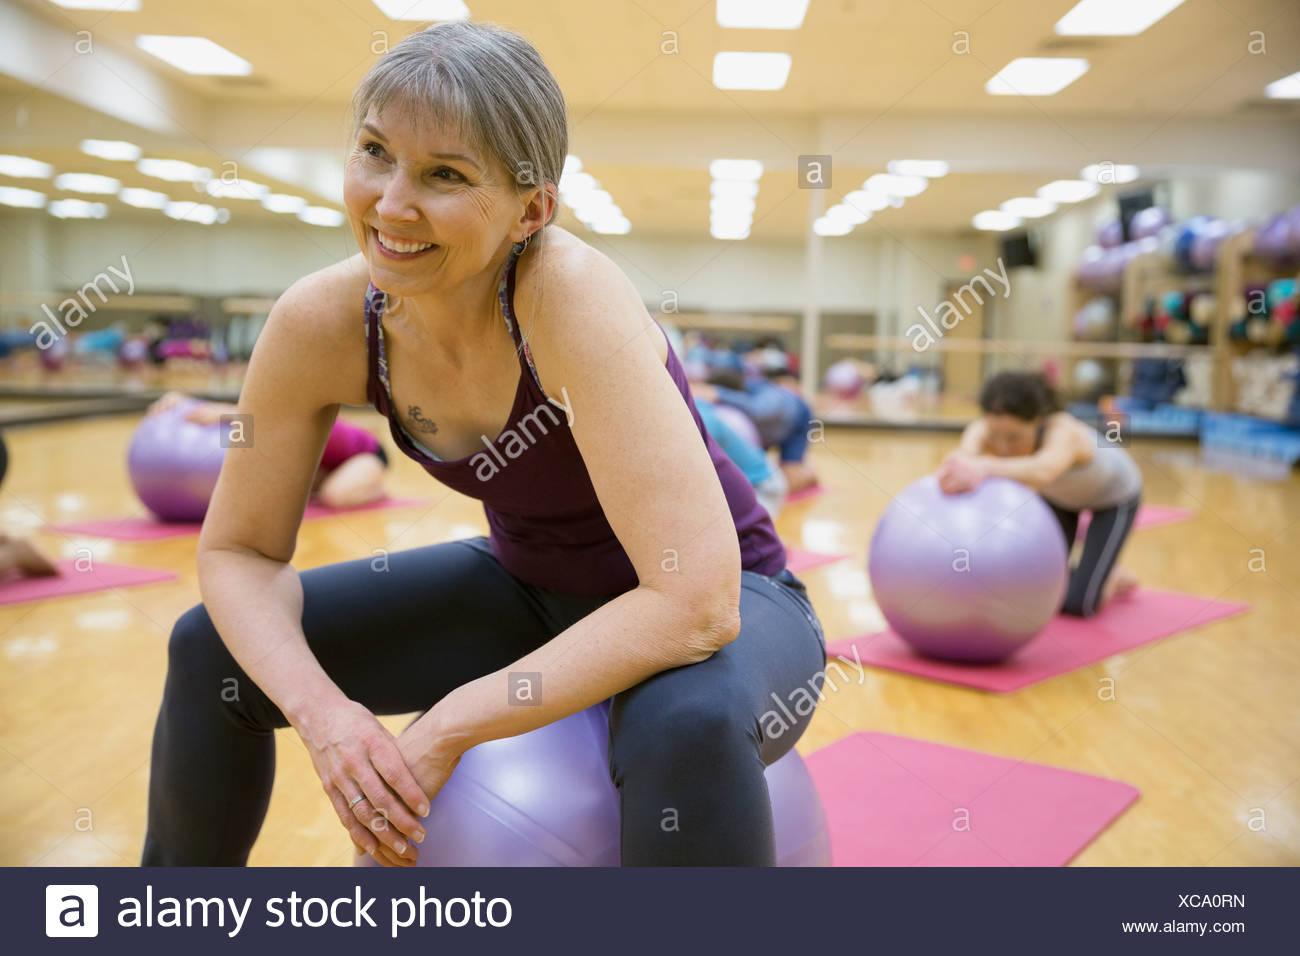 Lächelnde Frau auf Fitness-Ball in Übung Stockbild